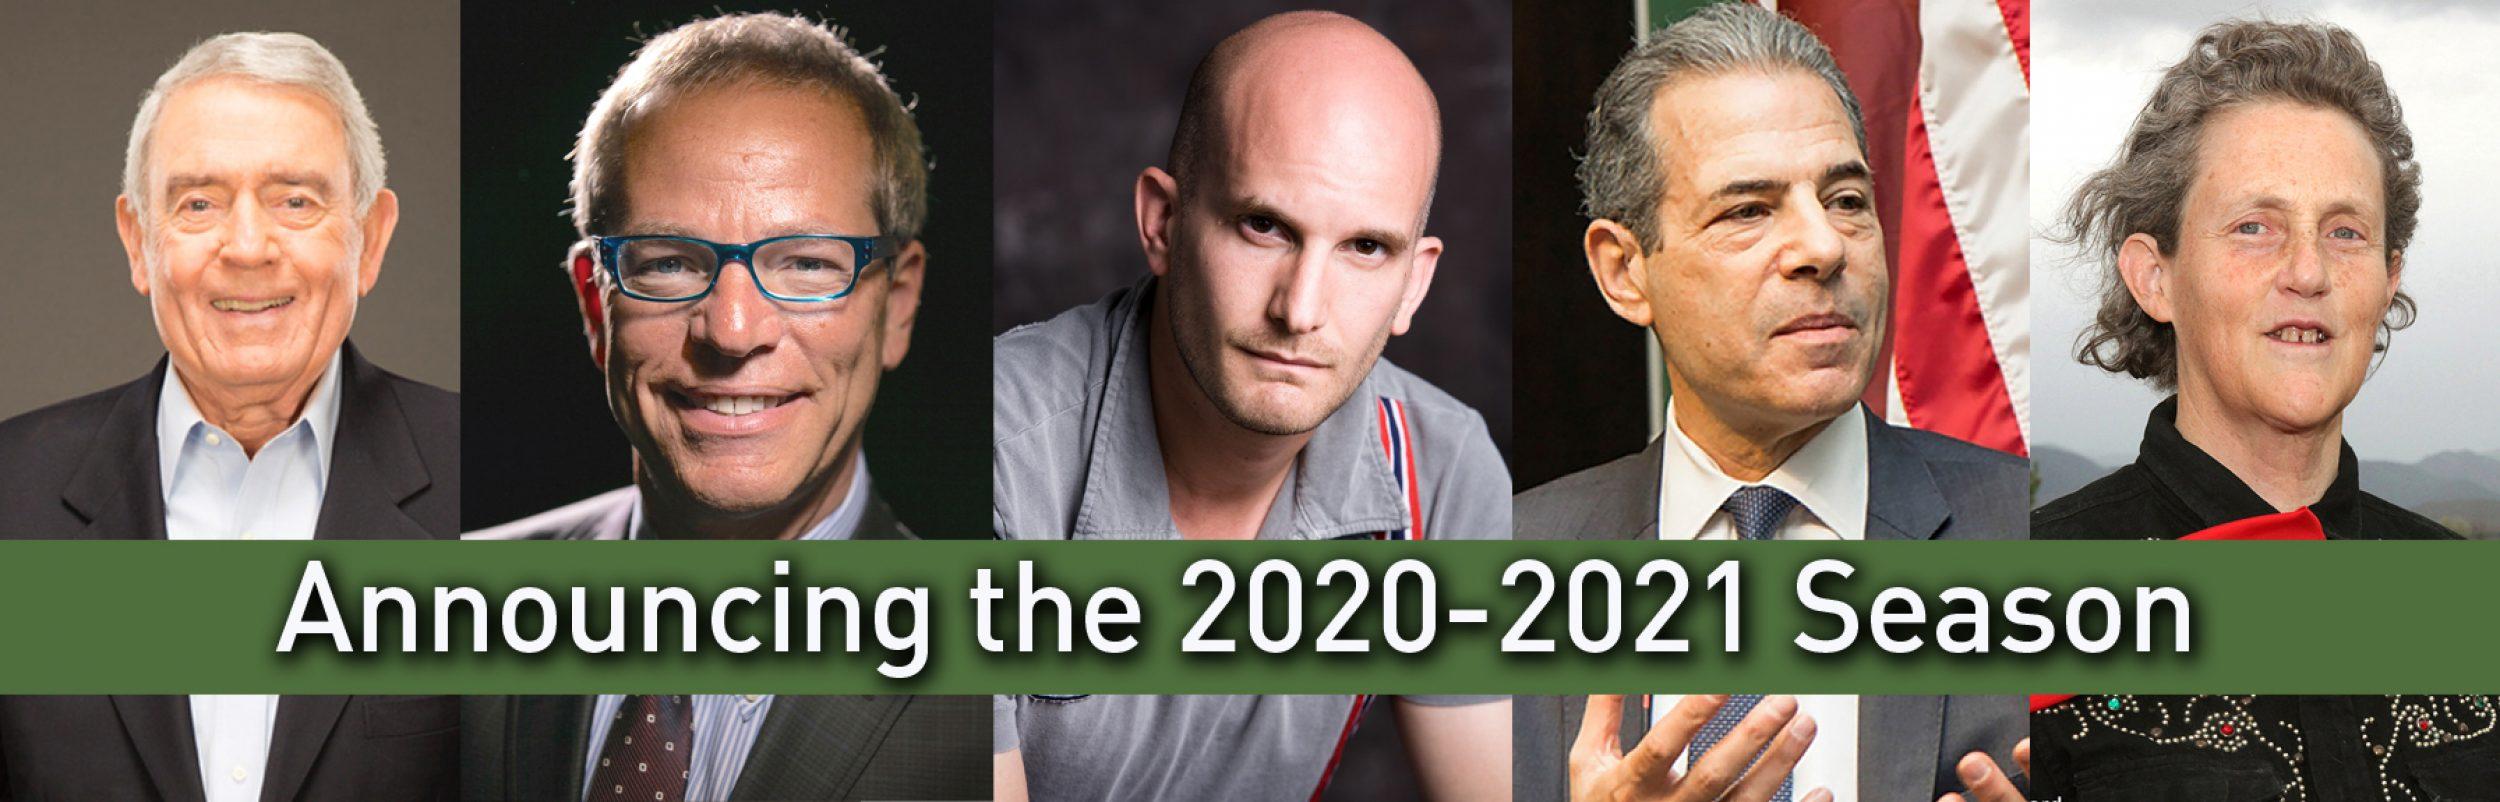 THS_2020-2021_headerImage